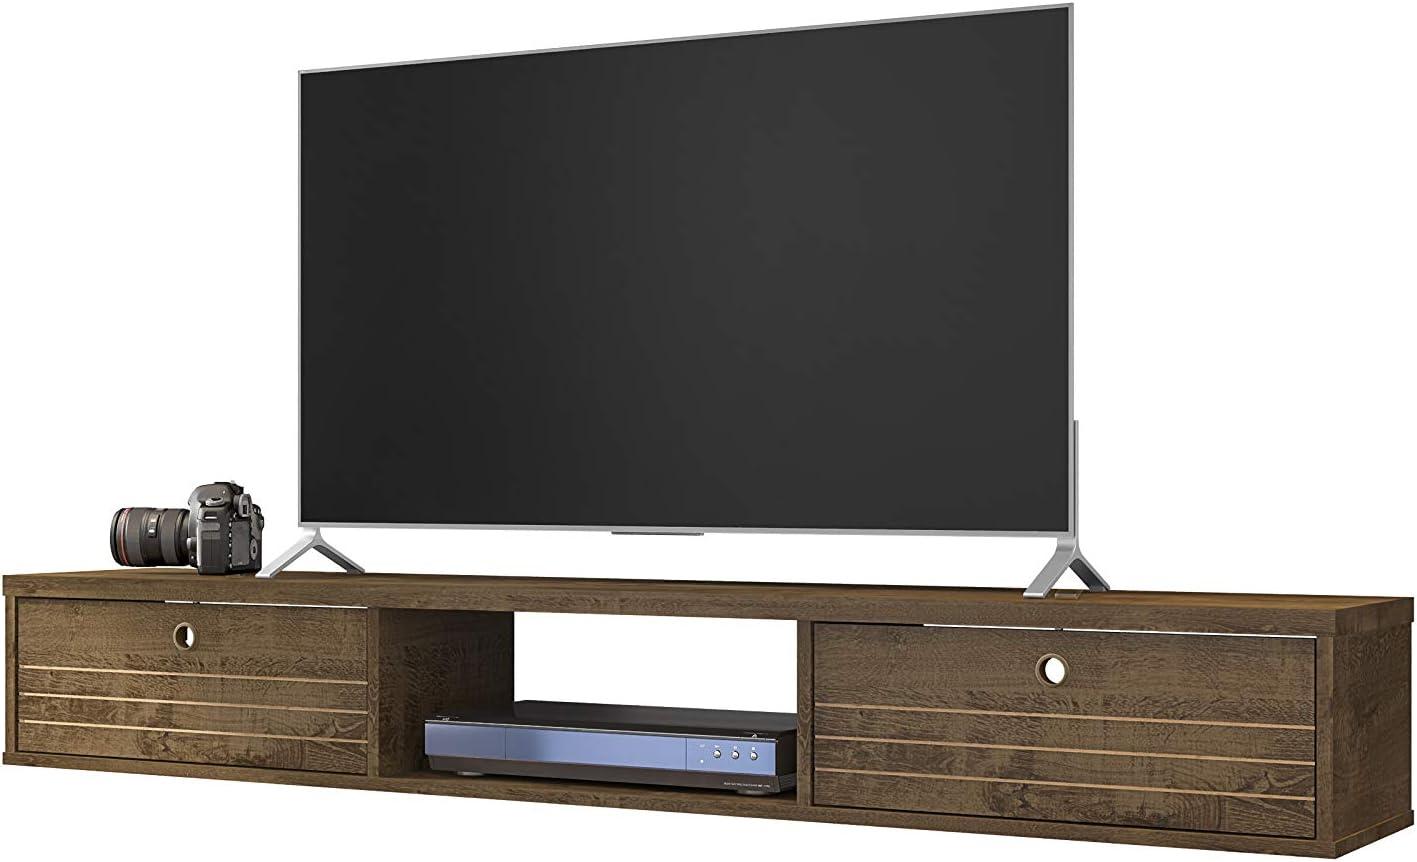 9 - Best Contemporary Floating TV shelf: Manhattan Contemporary Wall Mounted Shelf